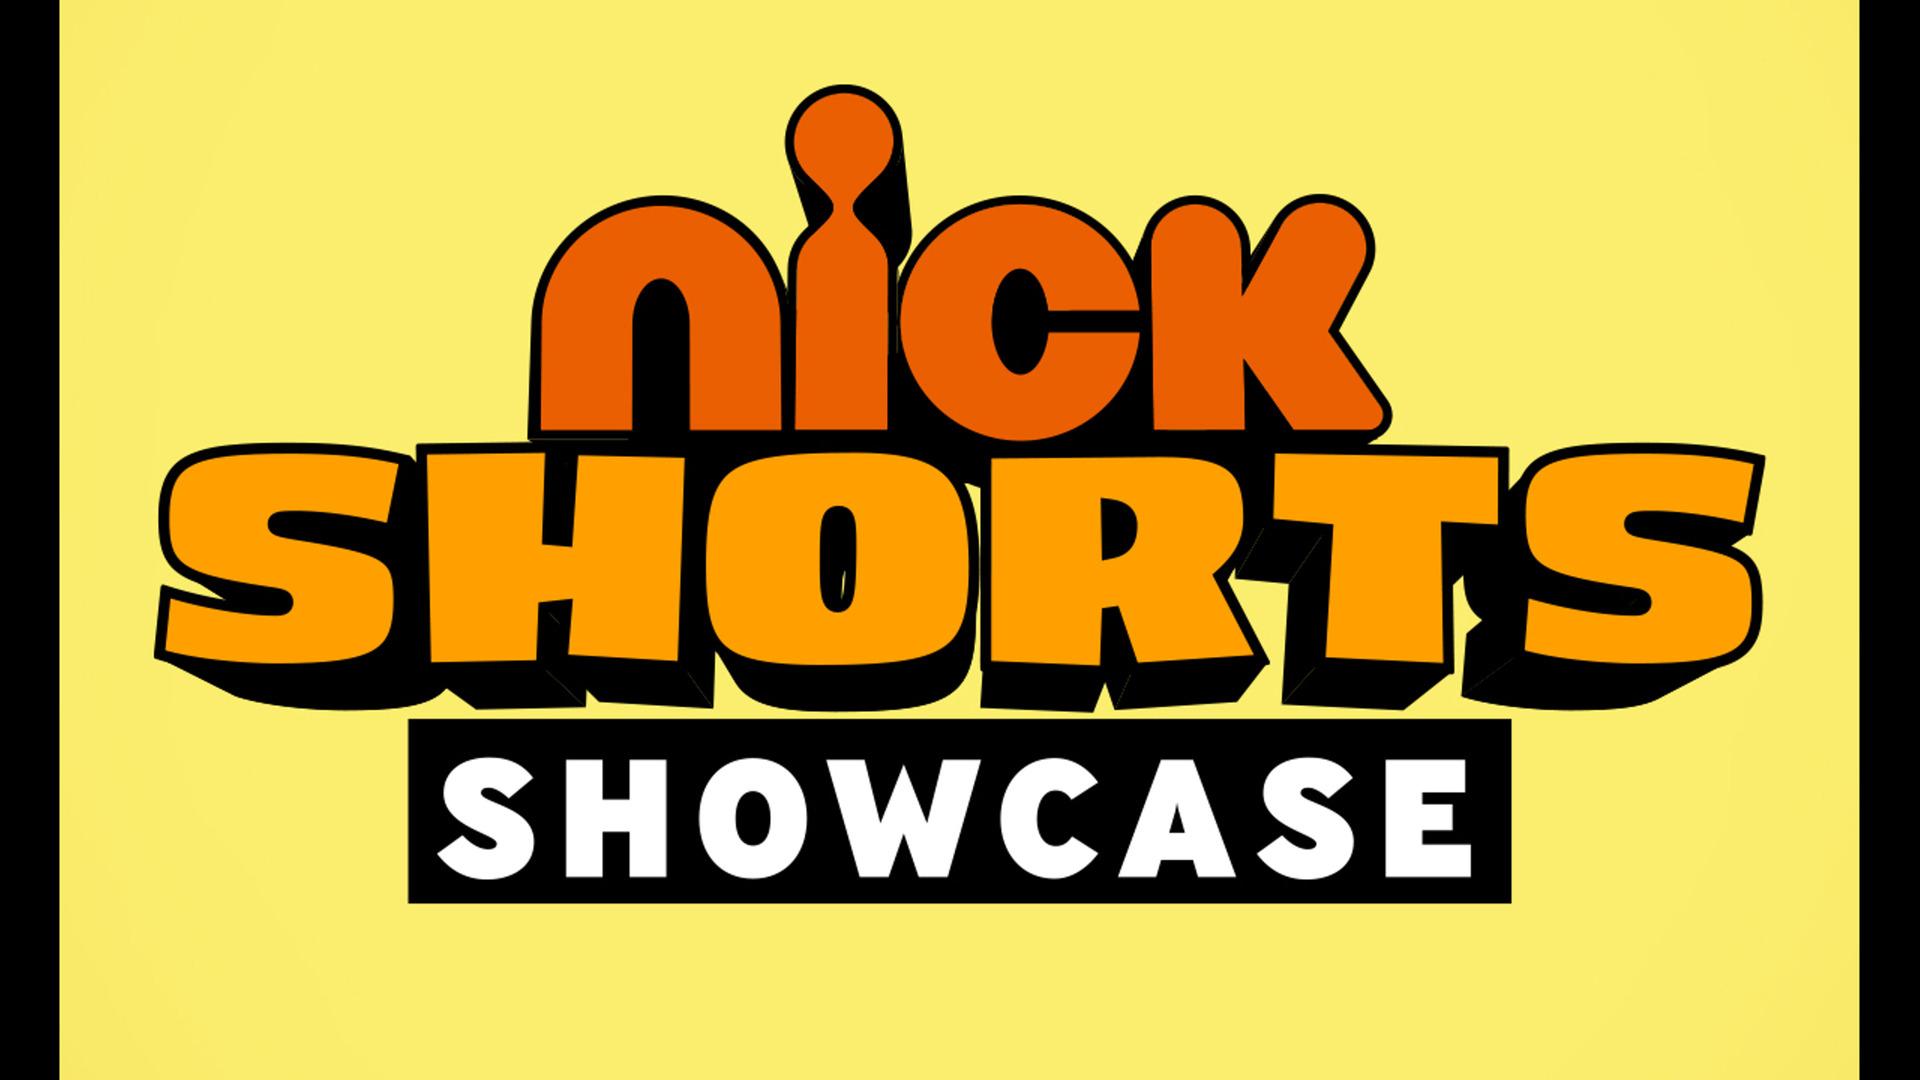 Сериал Nick Shorts Showcase